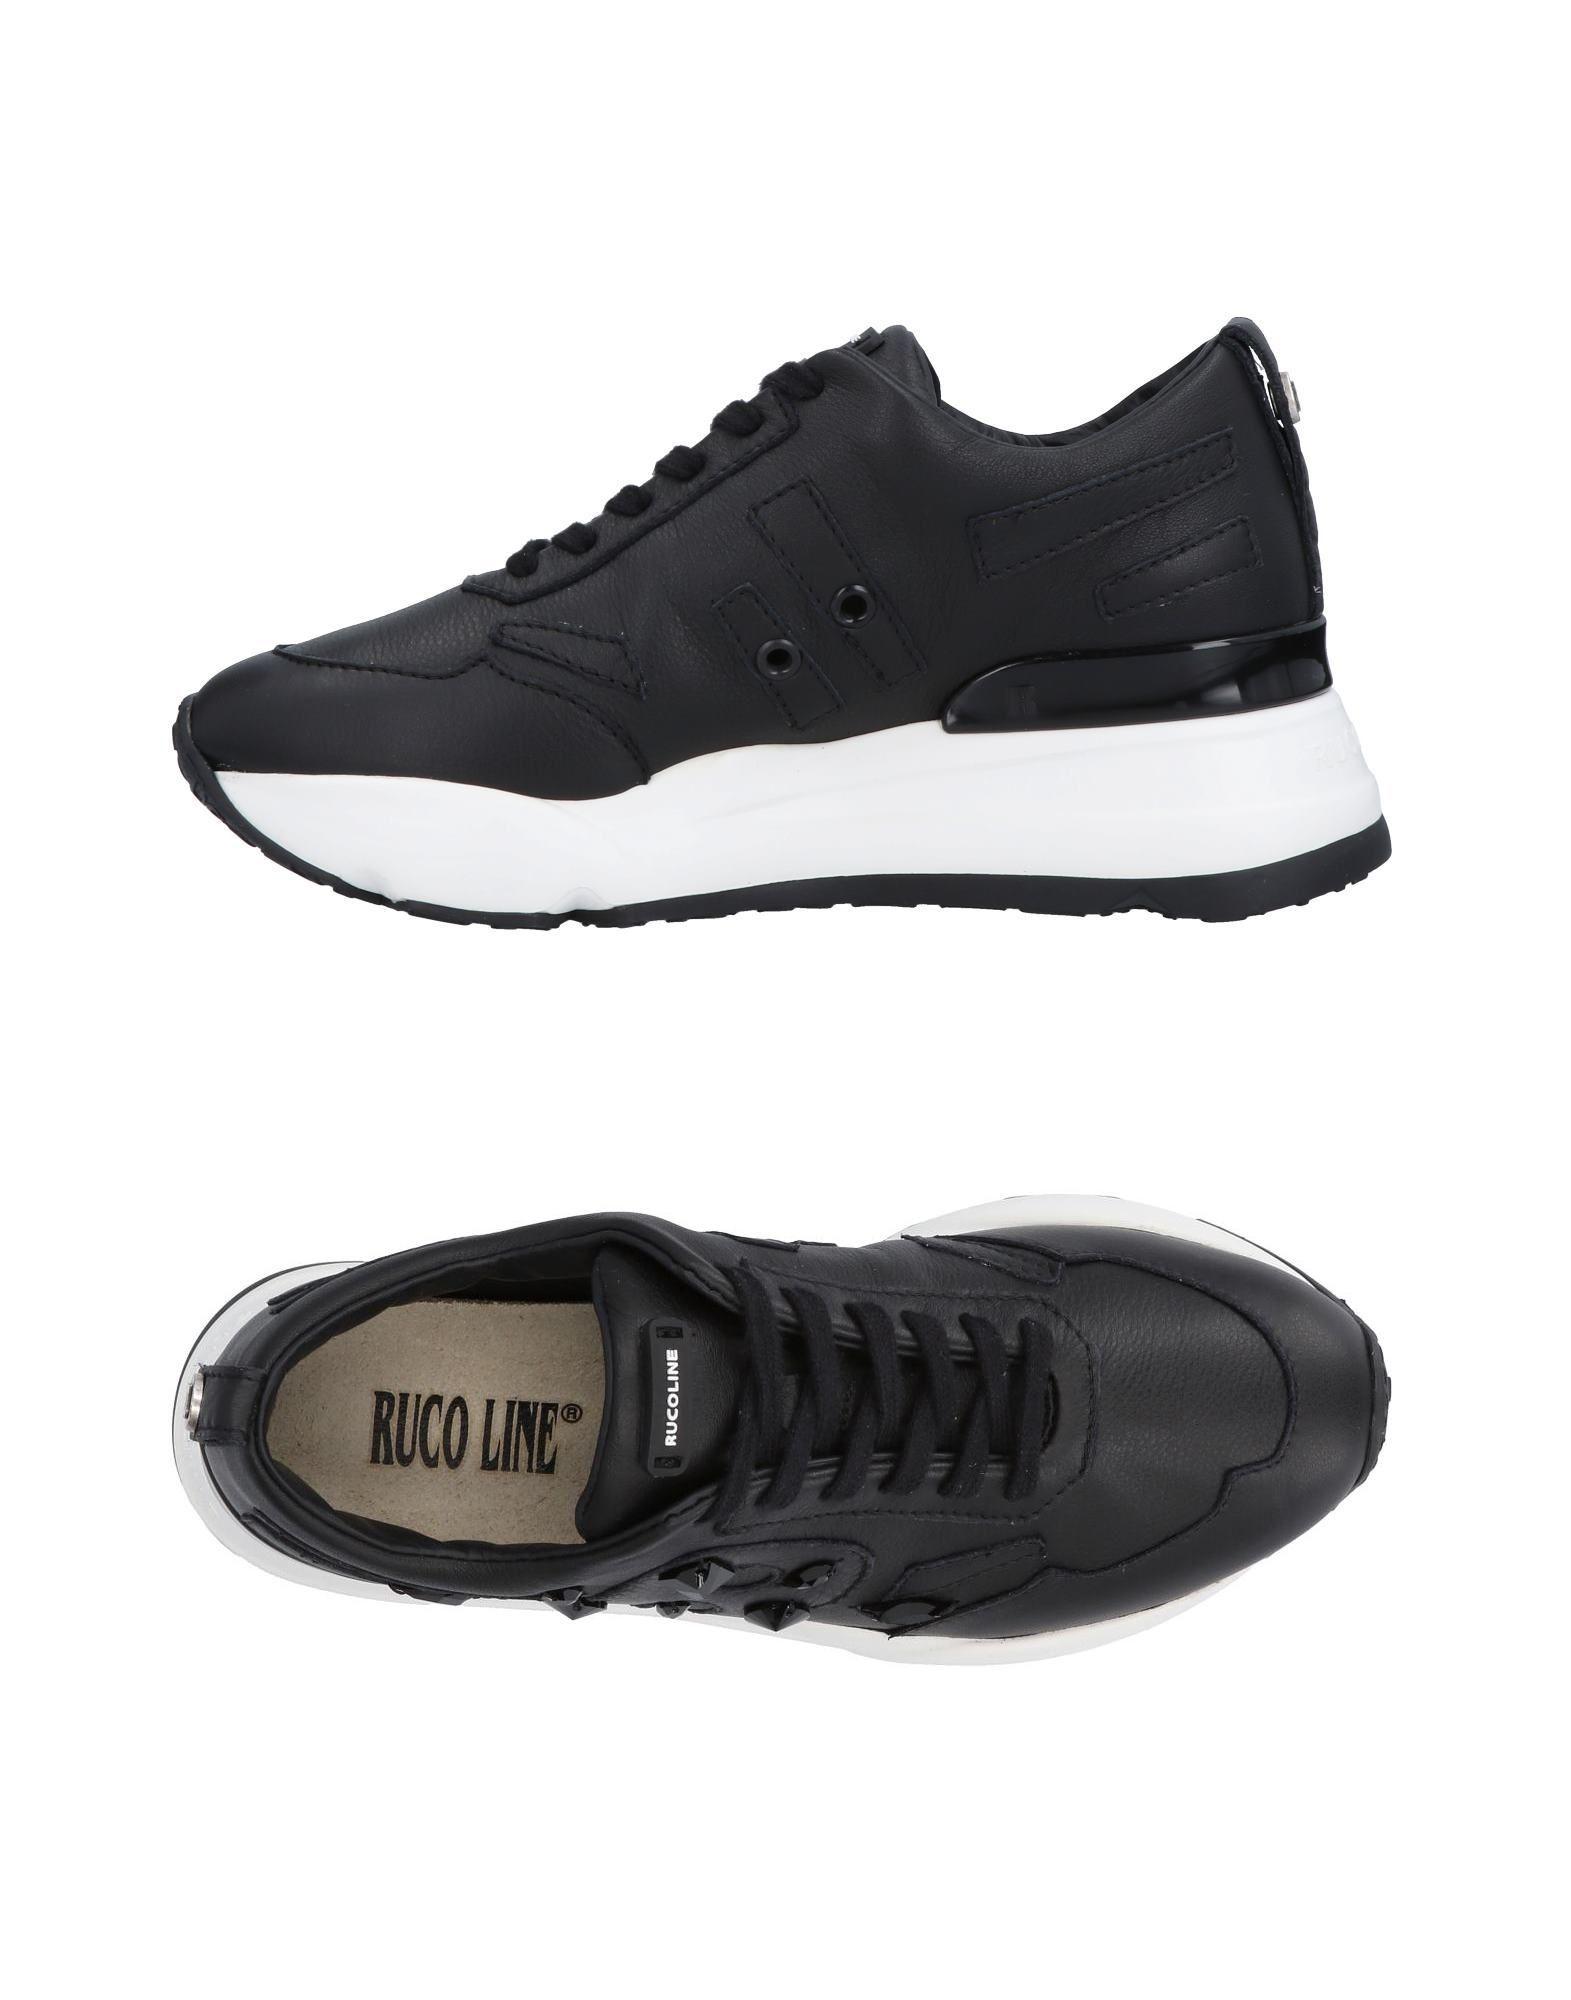 Stilvolle billige Sneakers Schuhe Ruco Line Sneakers billige Damen  11496125OF 756324